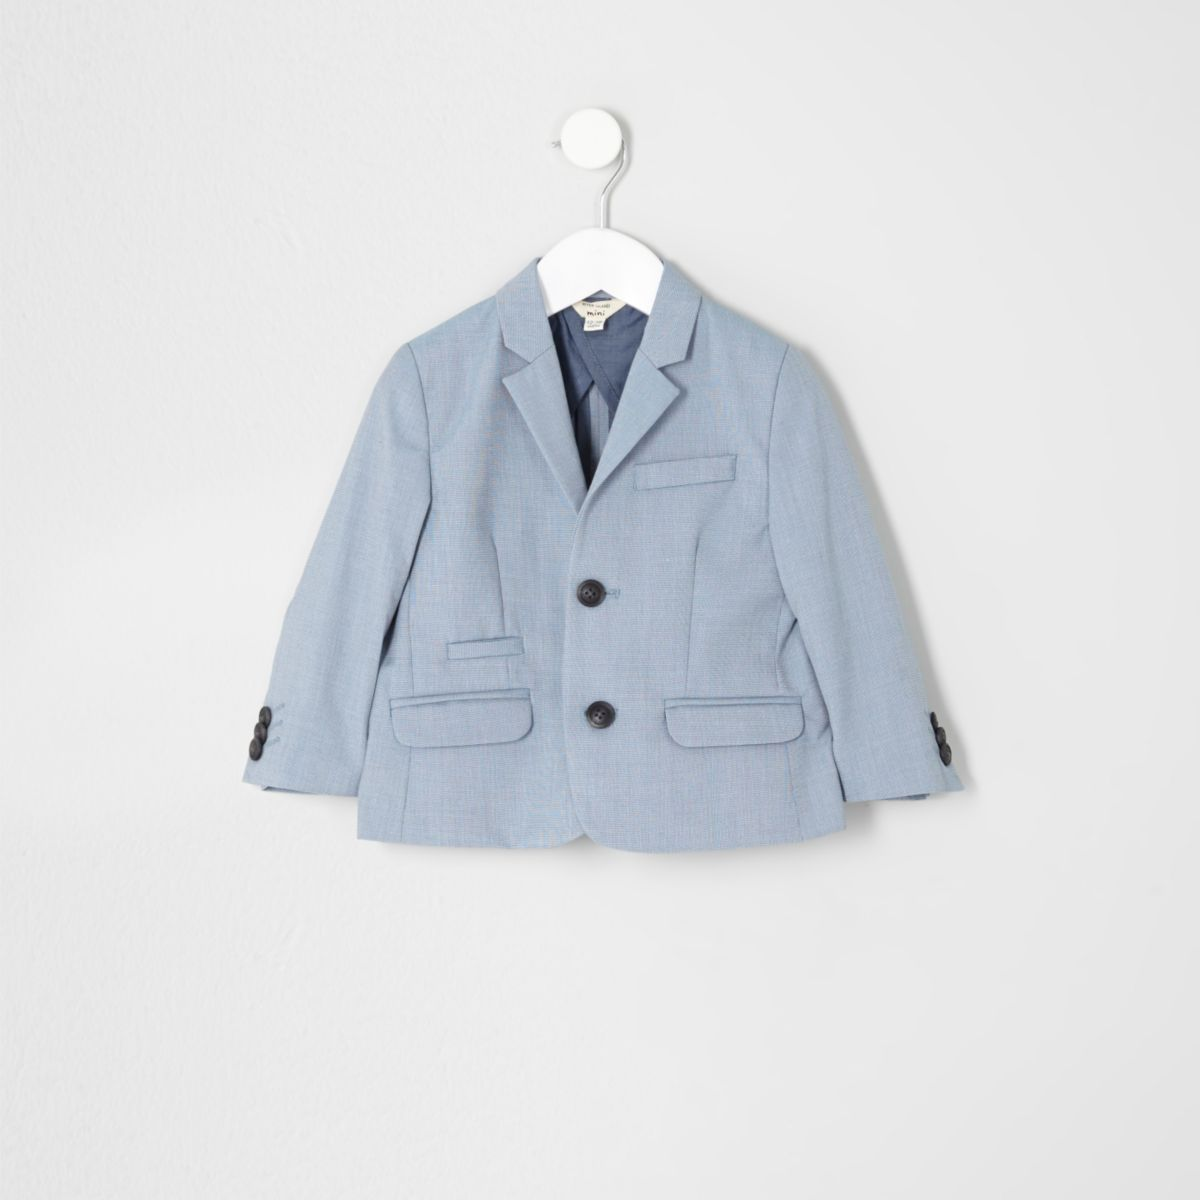 veste de costume bleu clair mini gar on tenues habill es soldes gar on. Black Bedroom Furniture Sets. Home Design Ideas